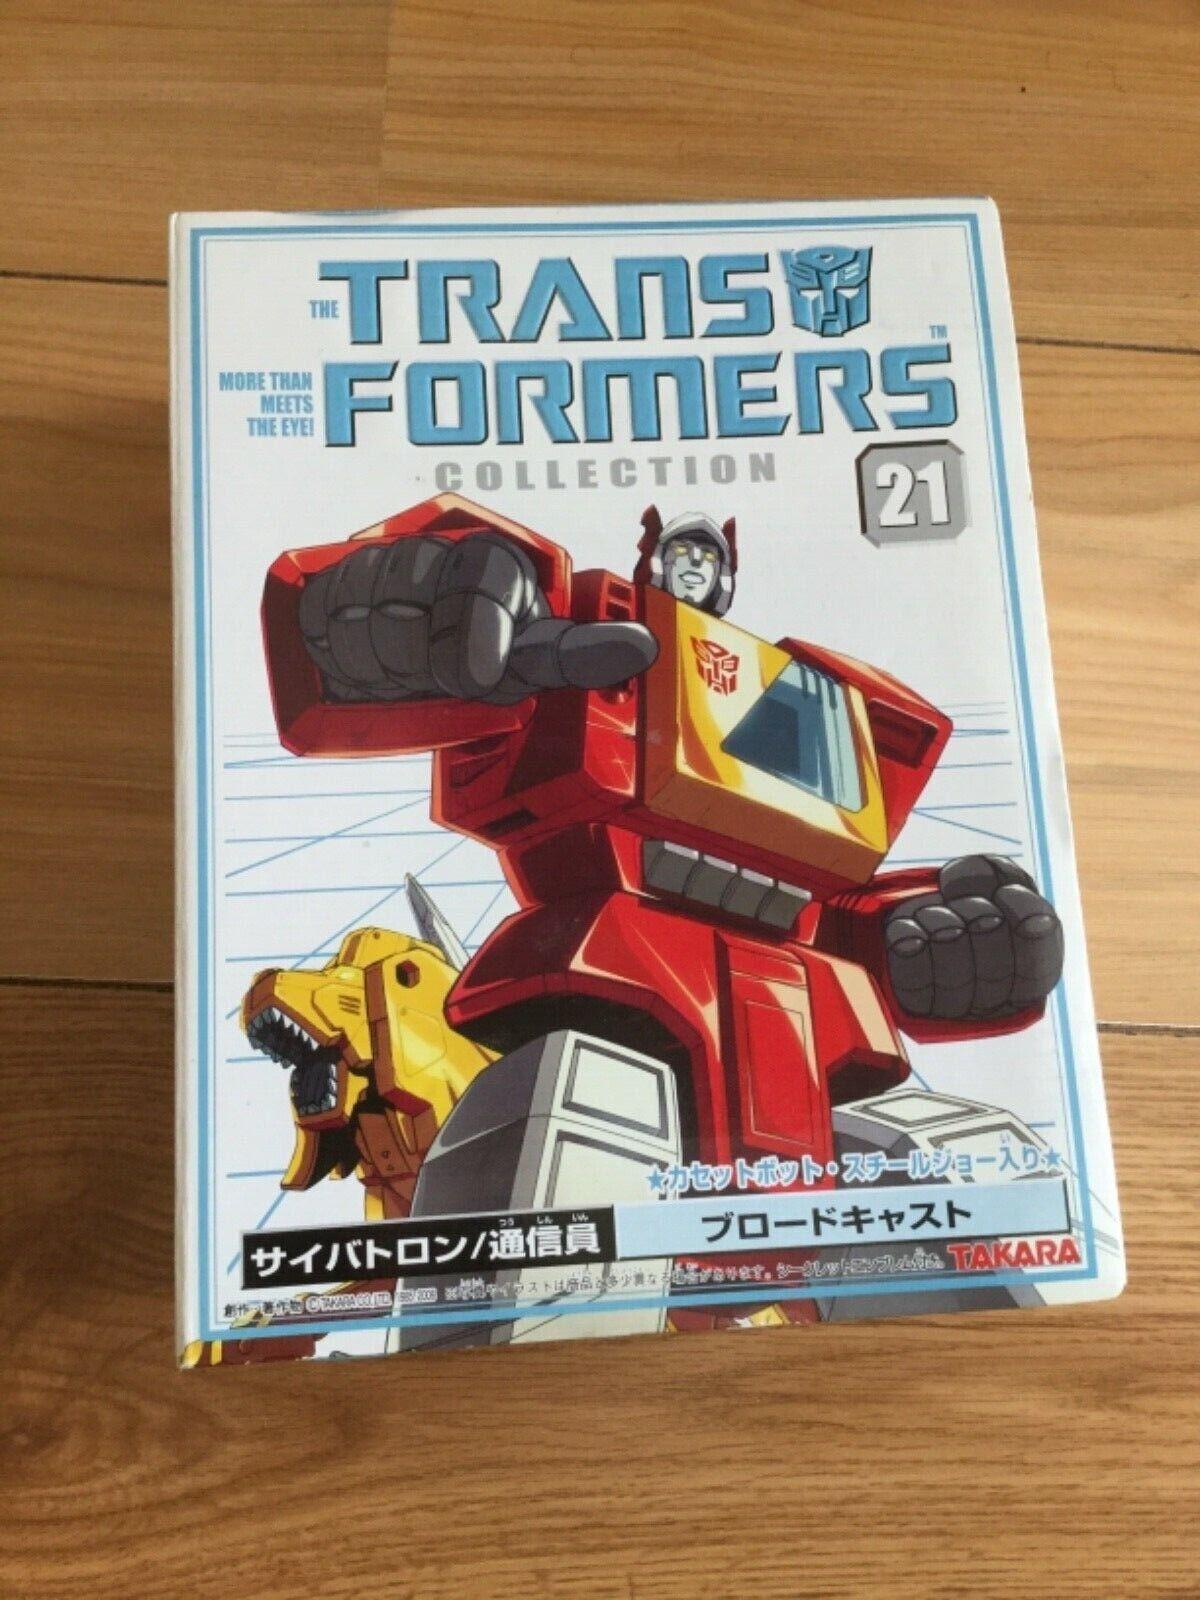 Transformers G1 Takara Book Collection 21 Blaster in box